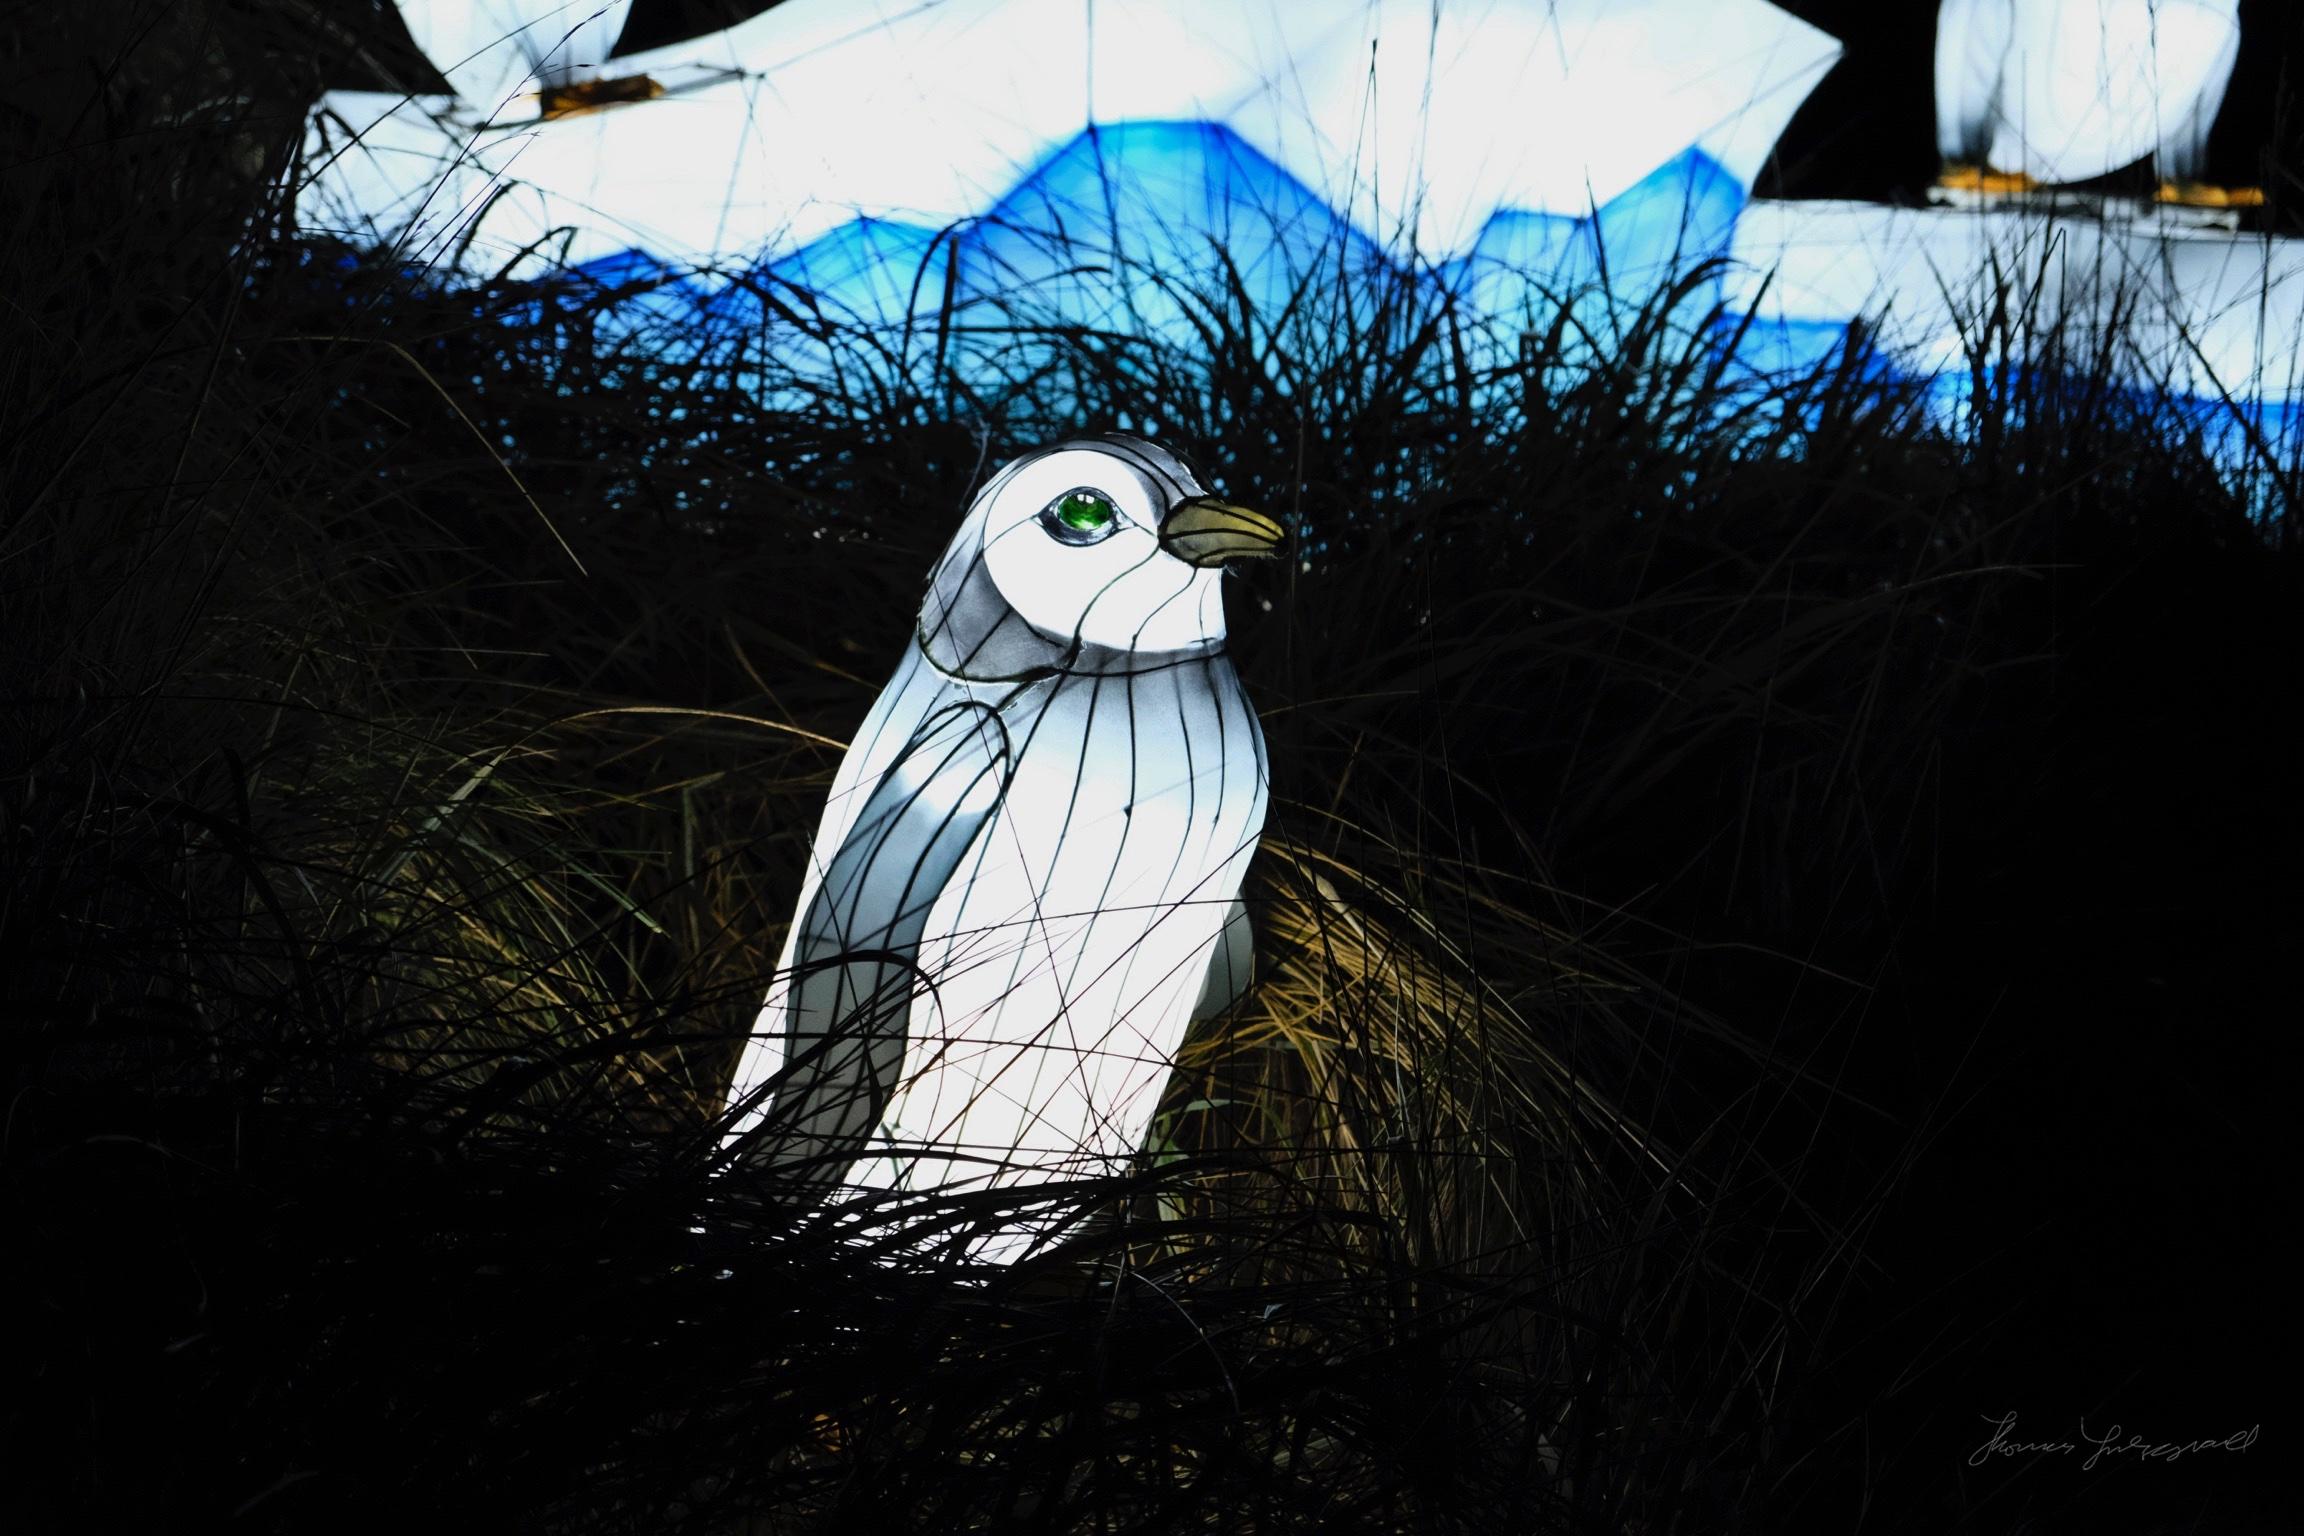 Wild-Lights-Dublin-Zoo-071.jpg